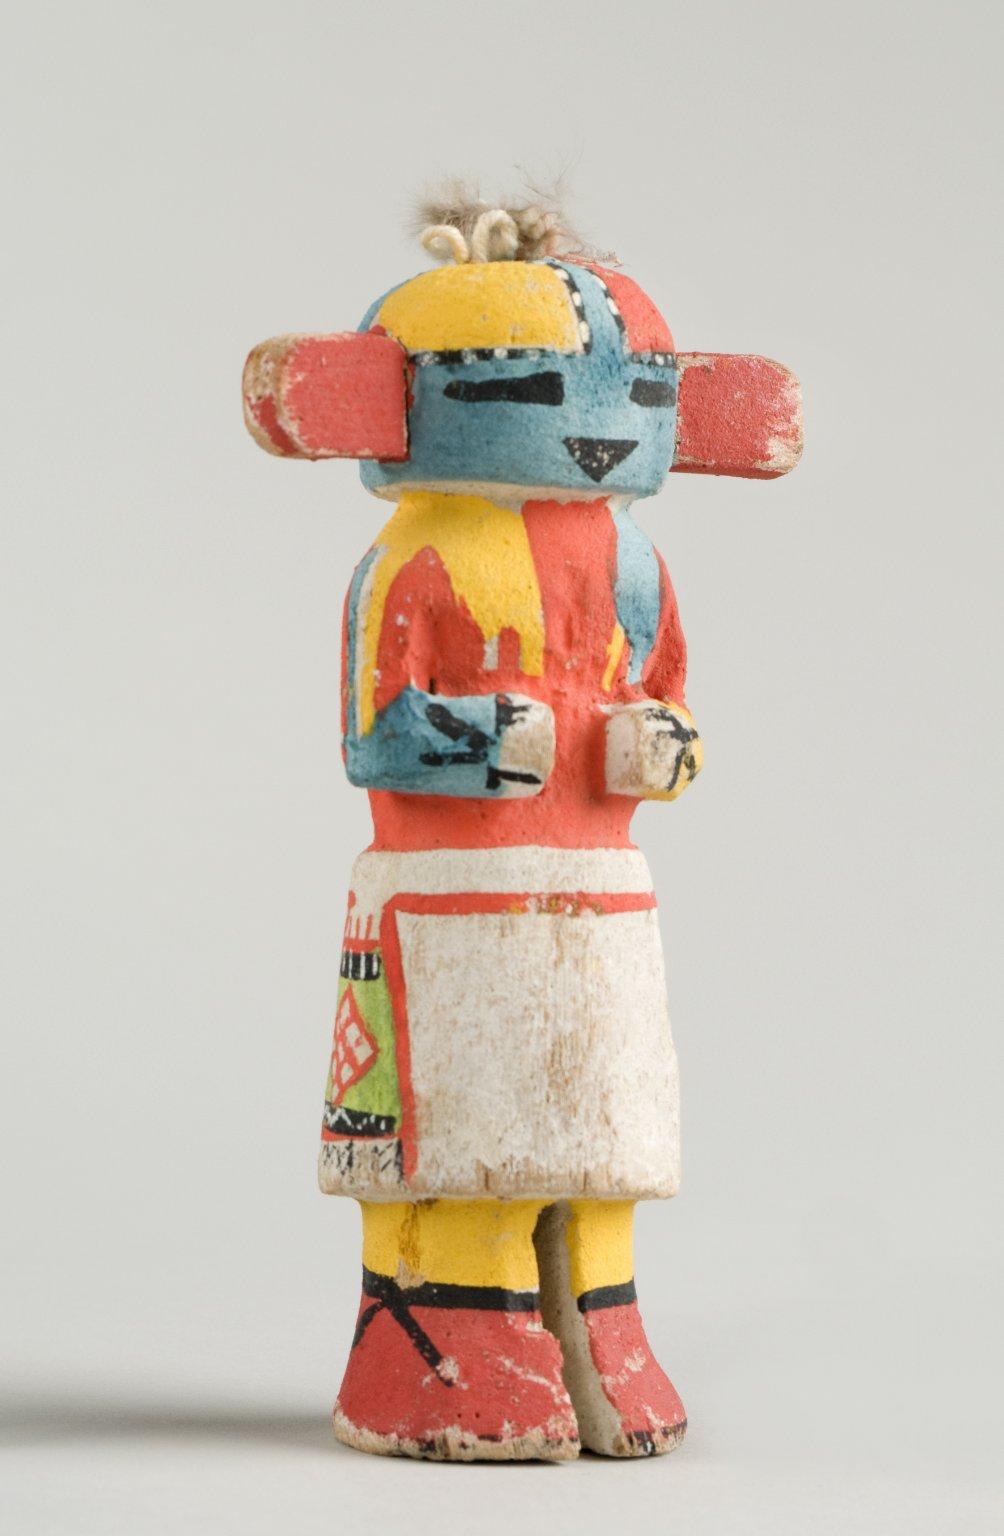 Morning Kachina Doll